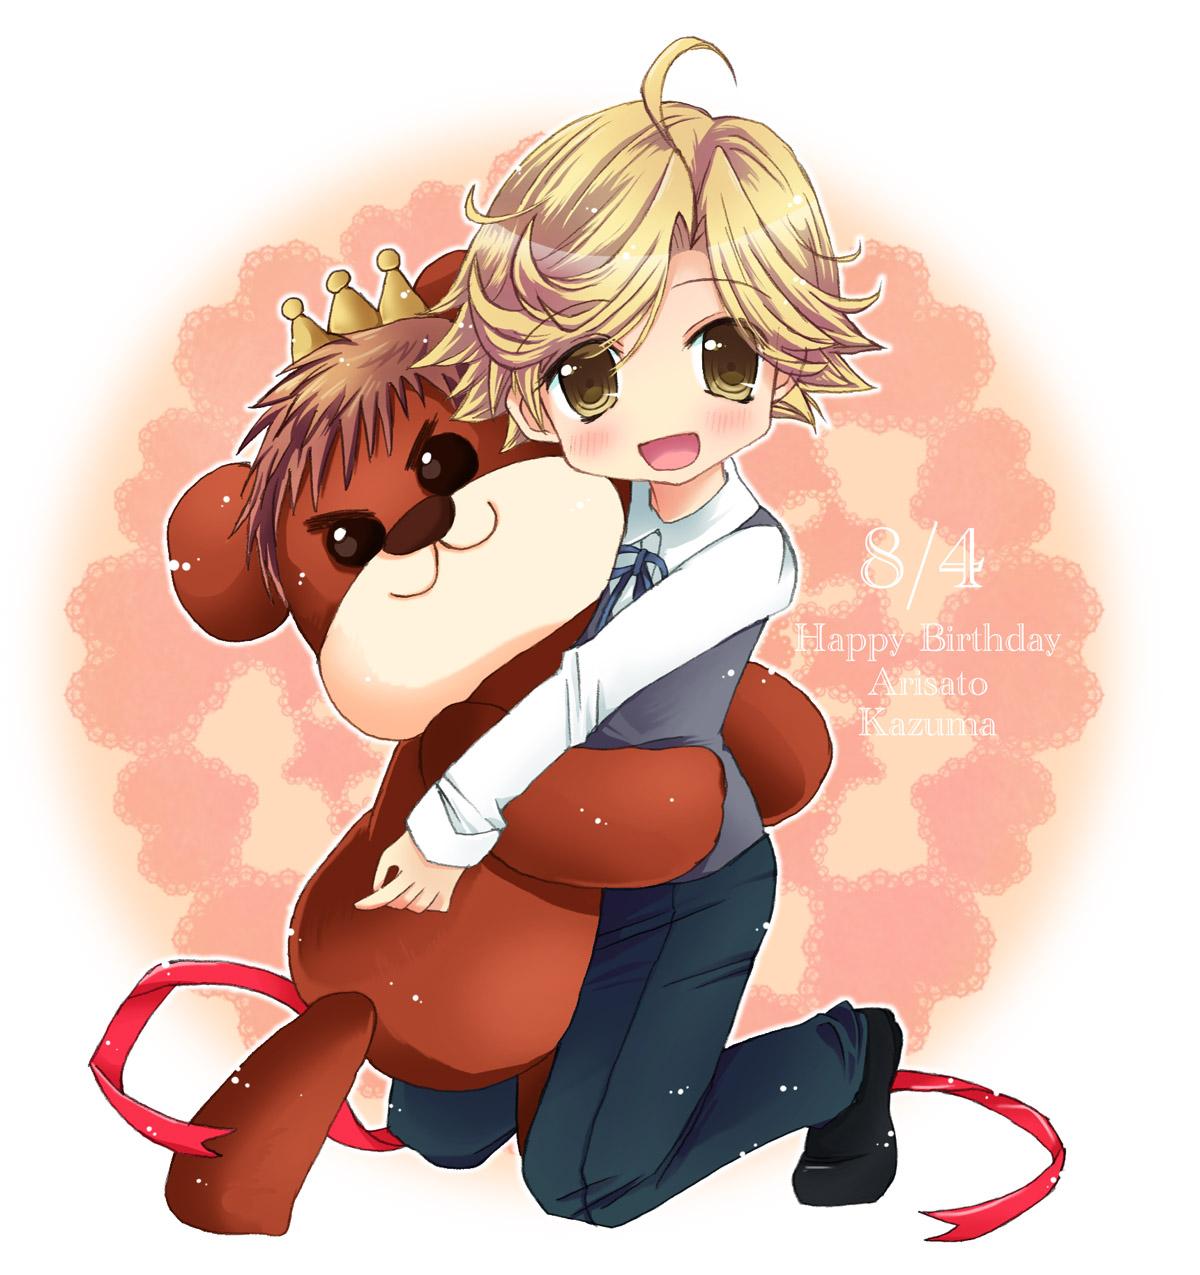 Hadaka Shitsuji Image #1332393 - Zerochan Anime Image Board